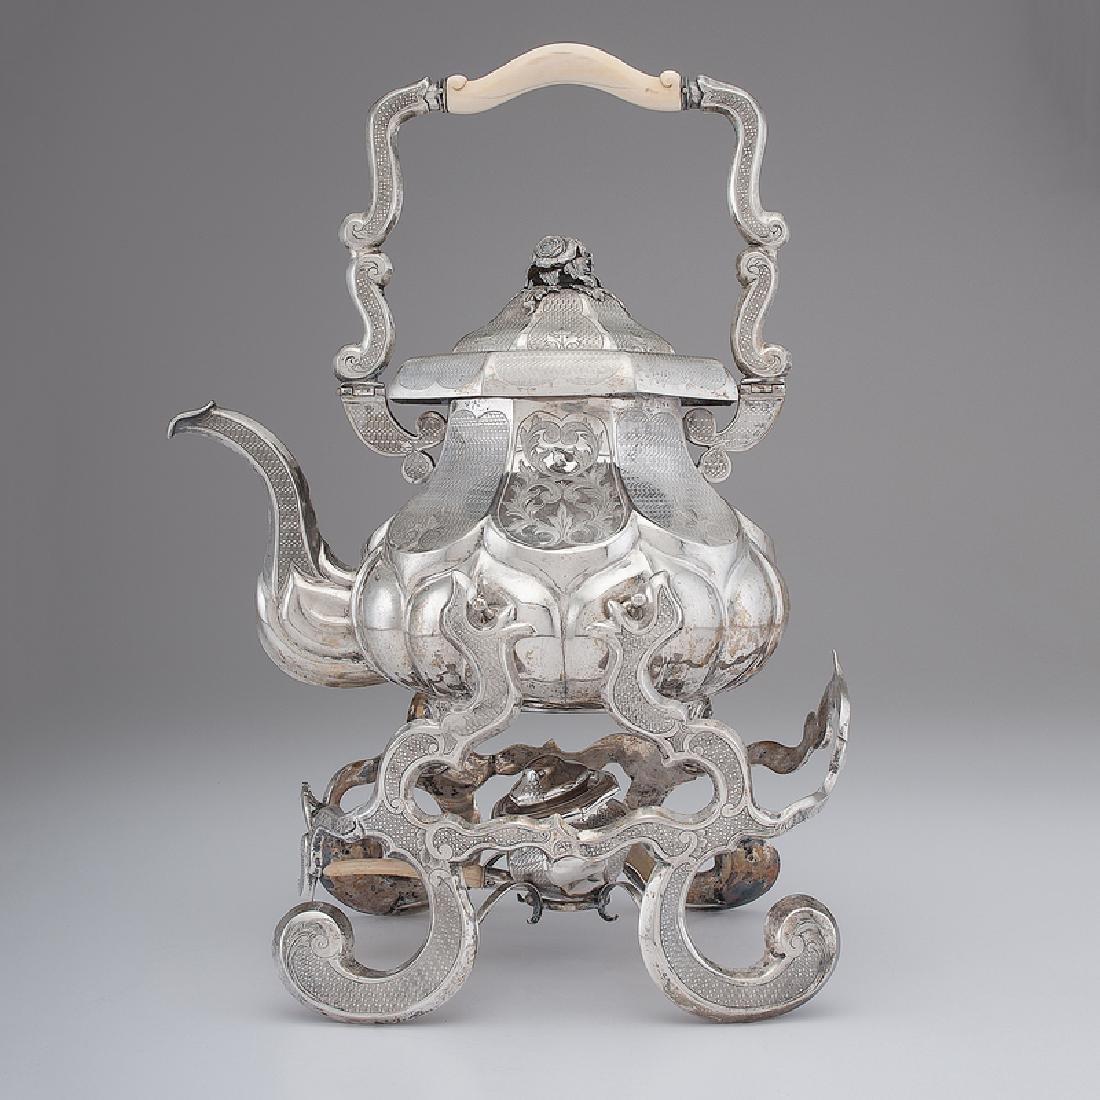 Austrian Silver Tea Kettle on Stand